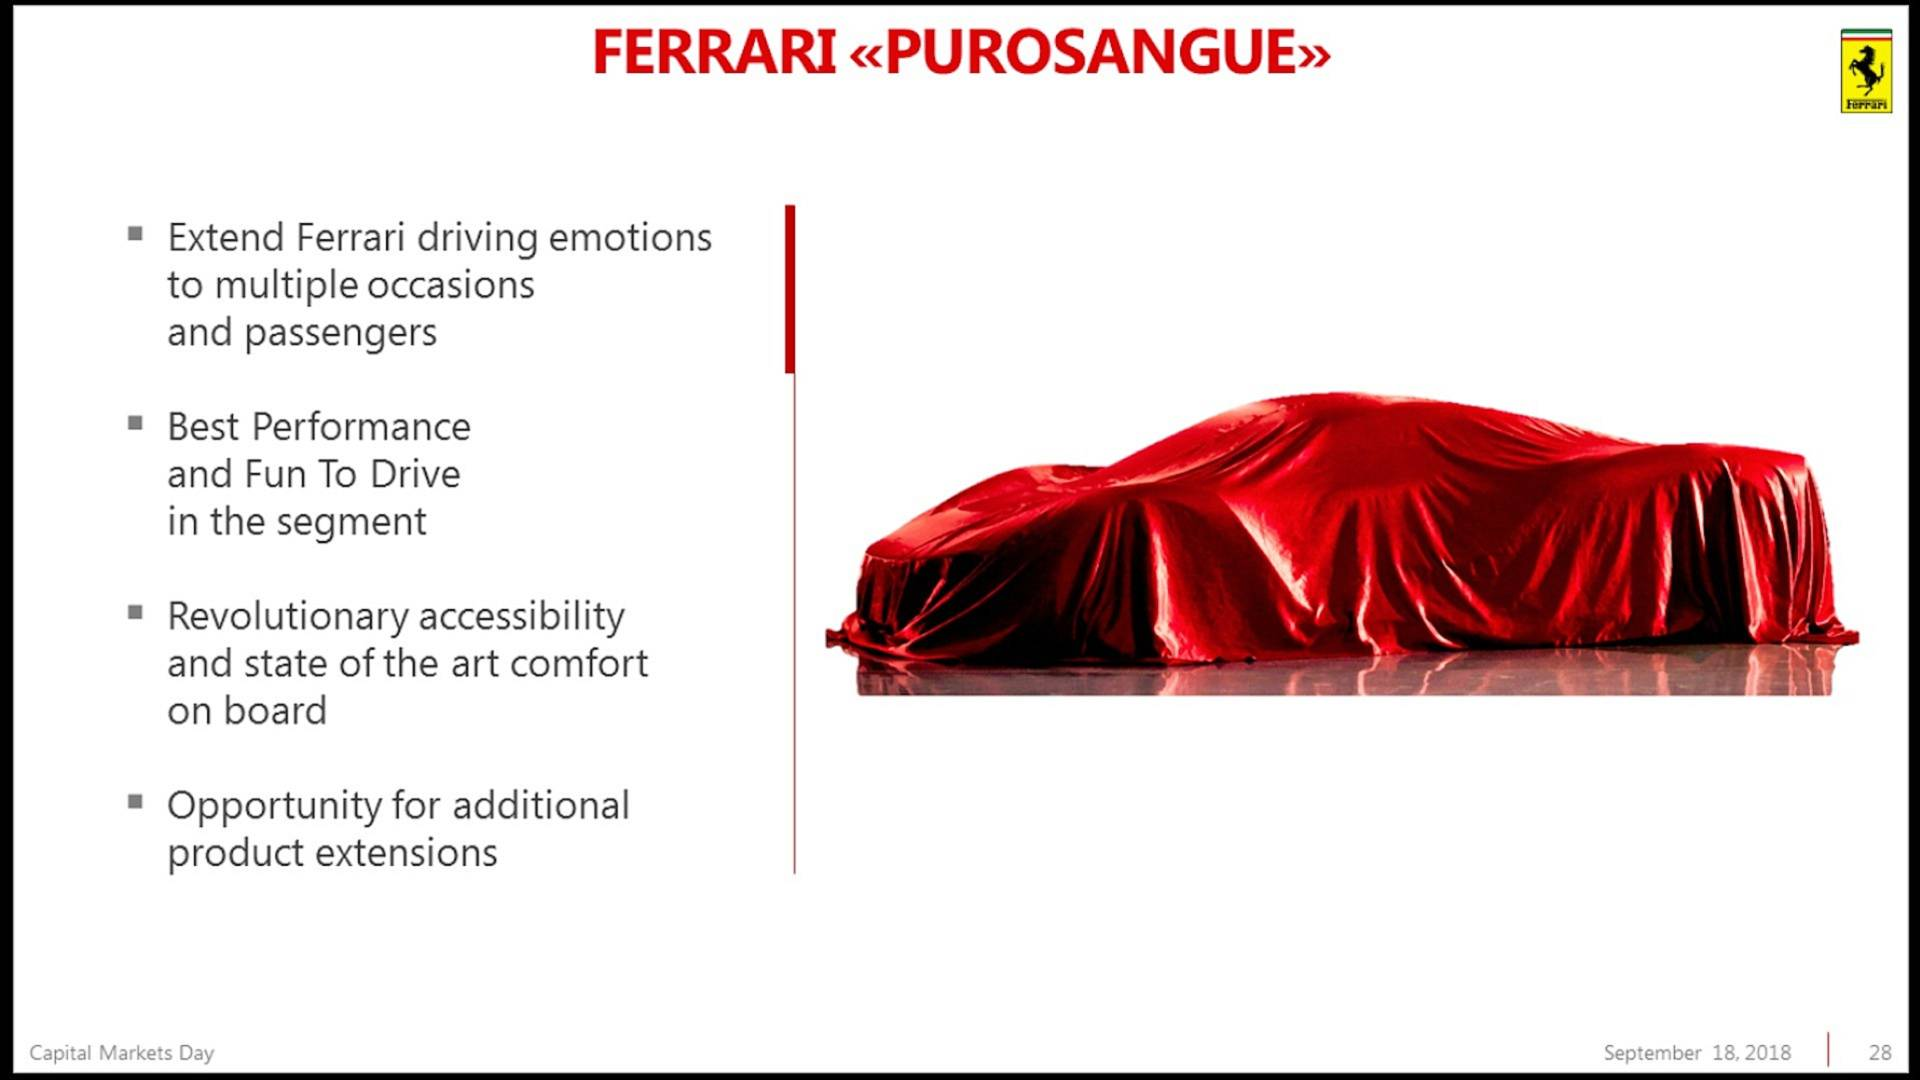 Piano Industriale Ferrari 2018-2022 (26)